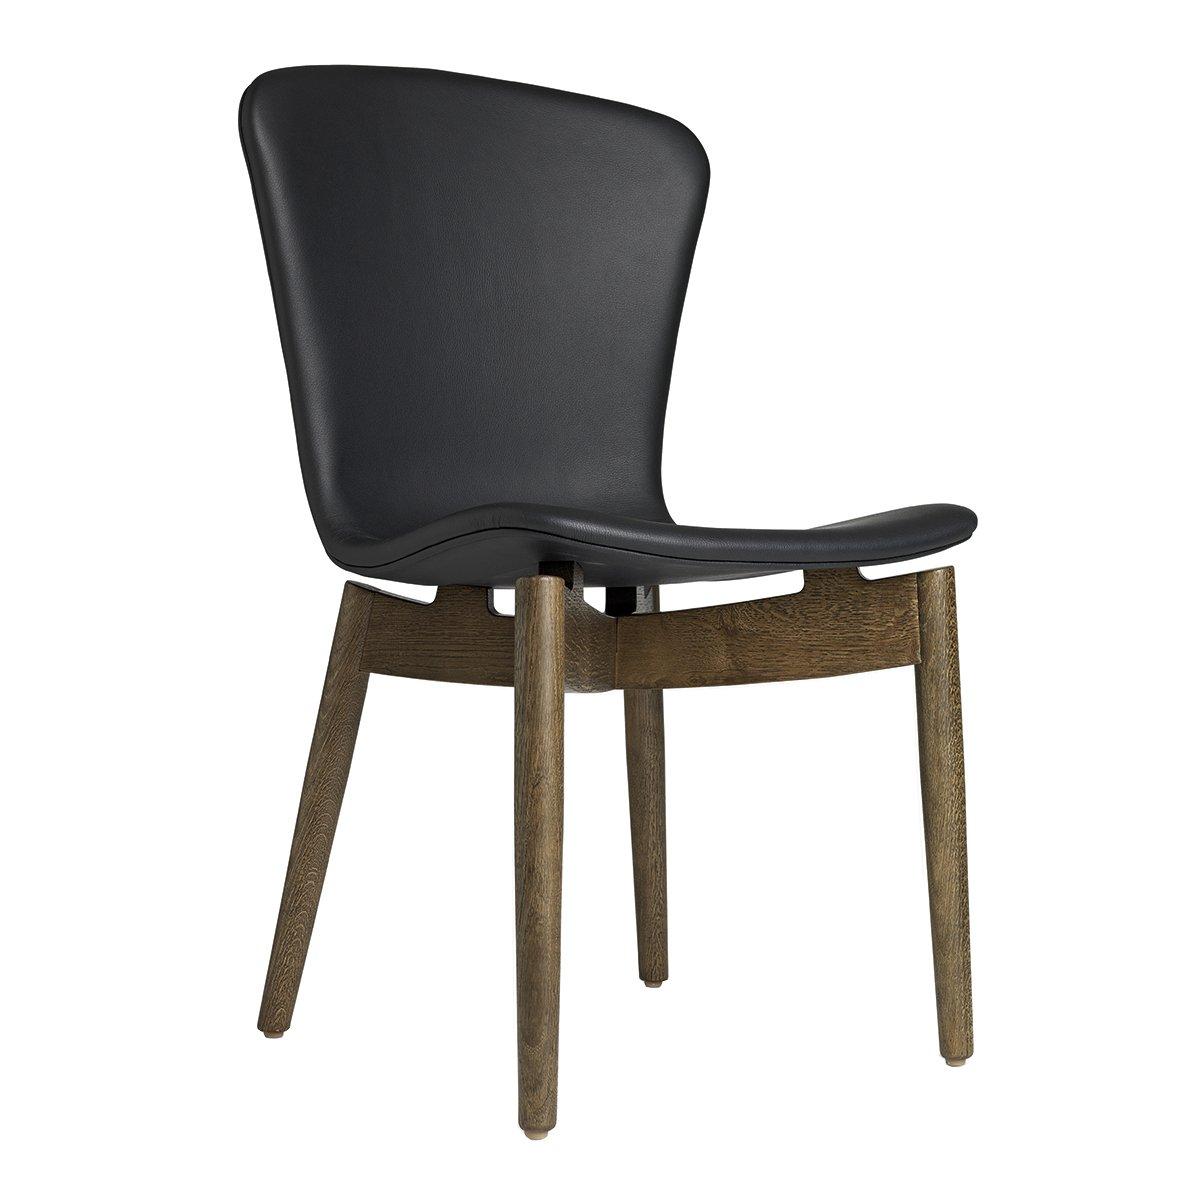 Mater Shell Dining Chair Eetkamerstoel - Ultra Black/Sirka Grey Gebeitst